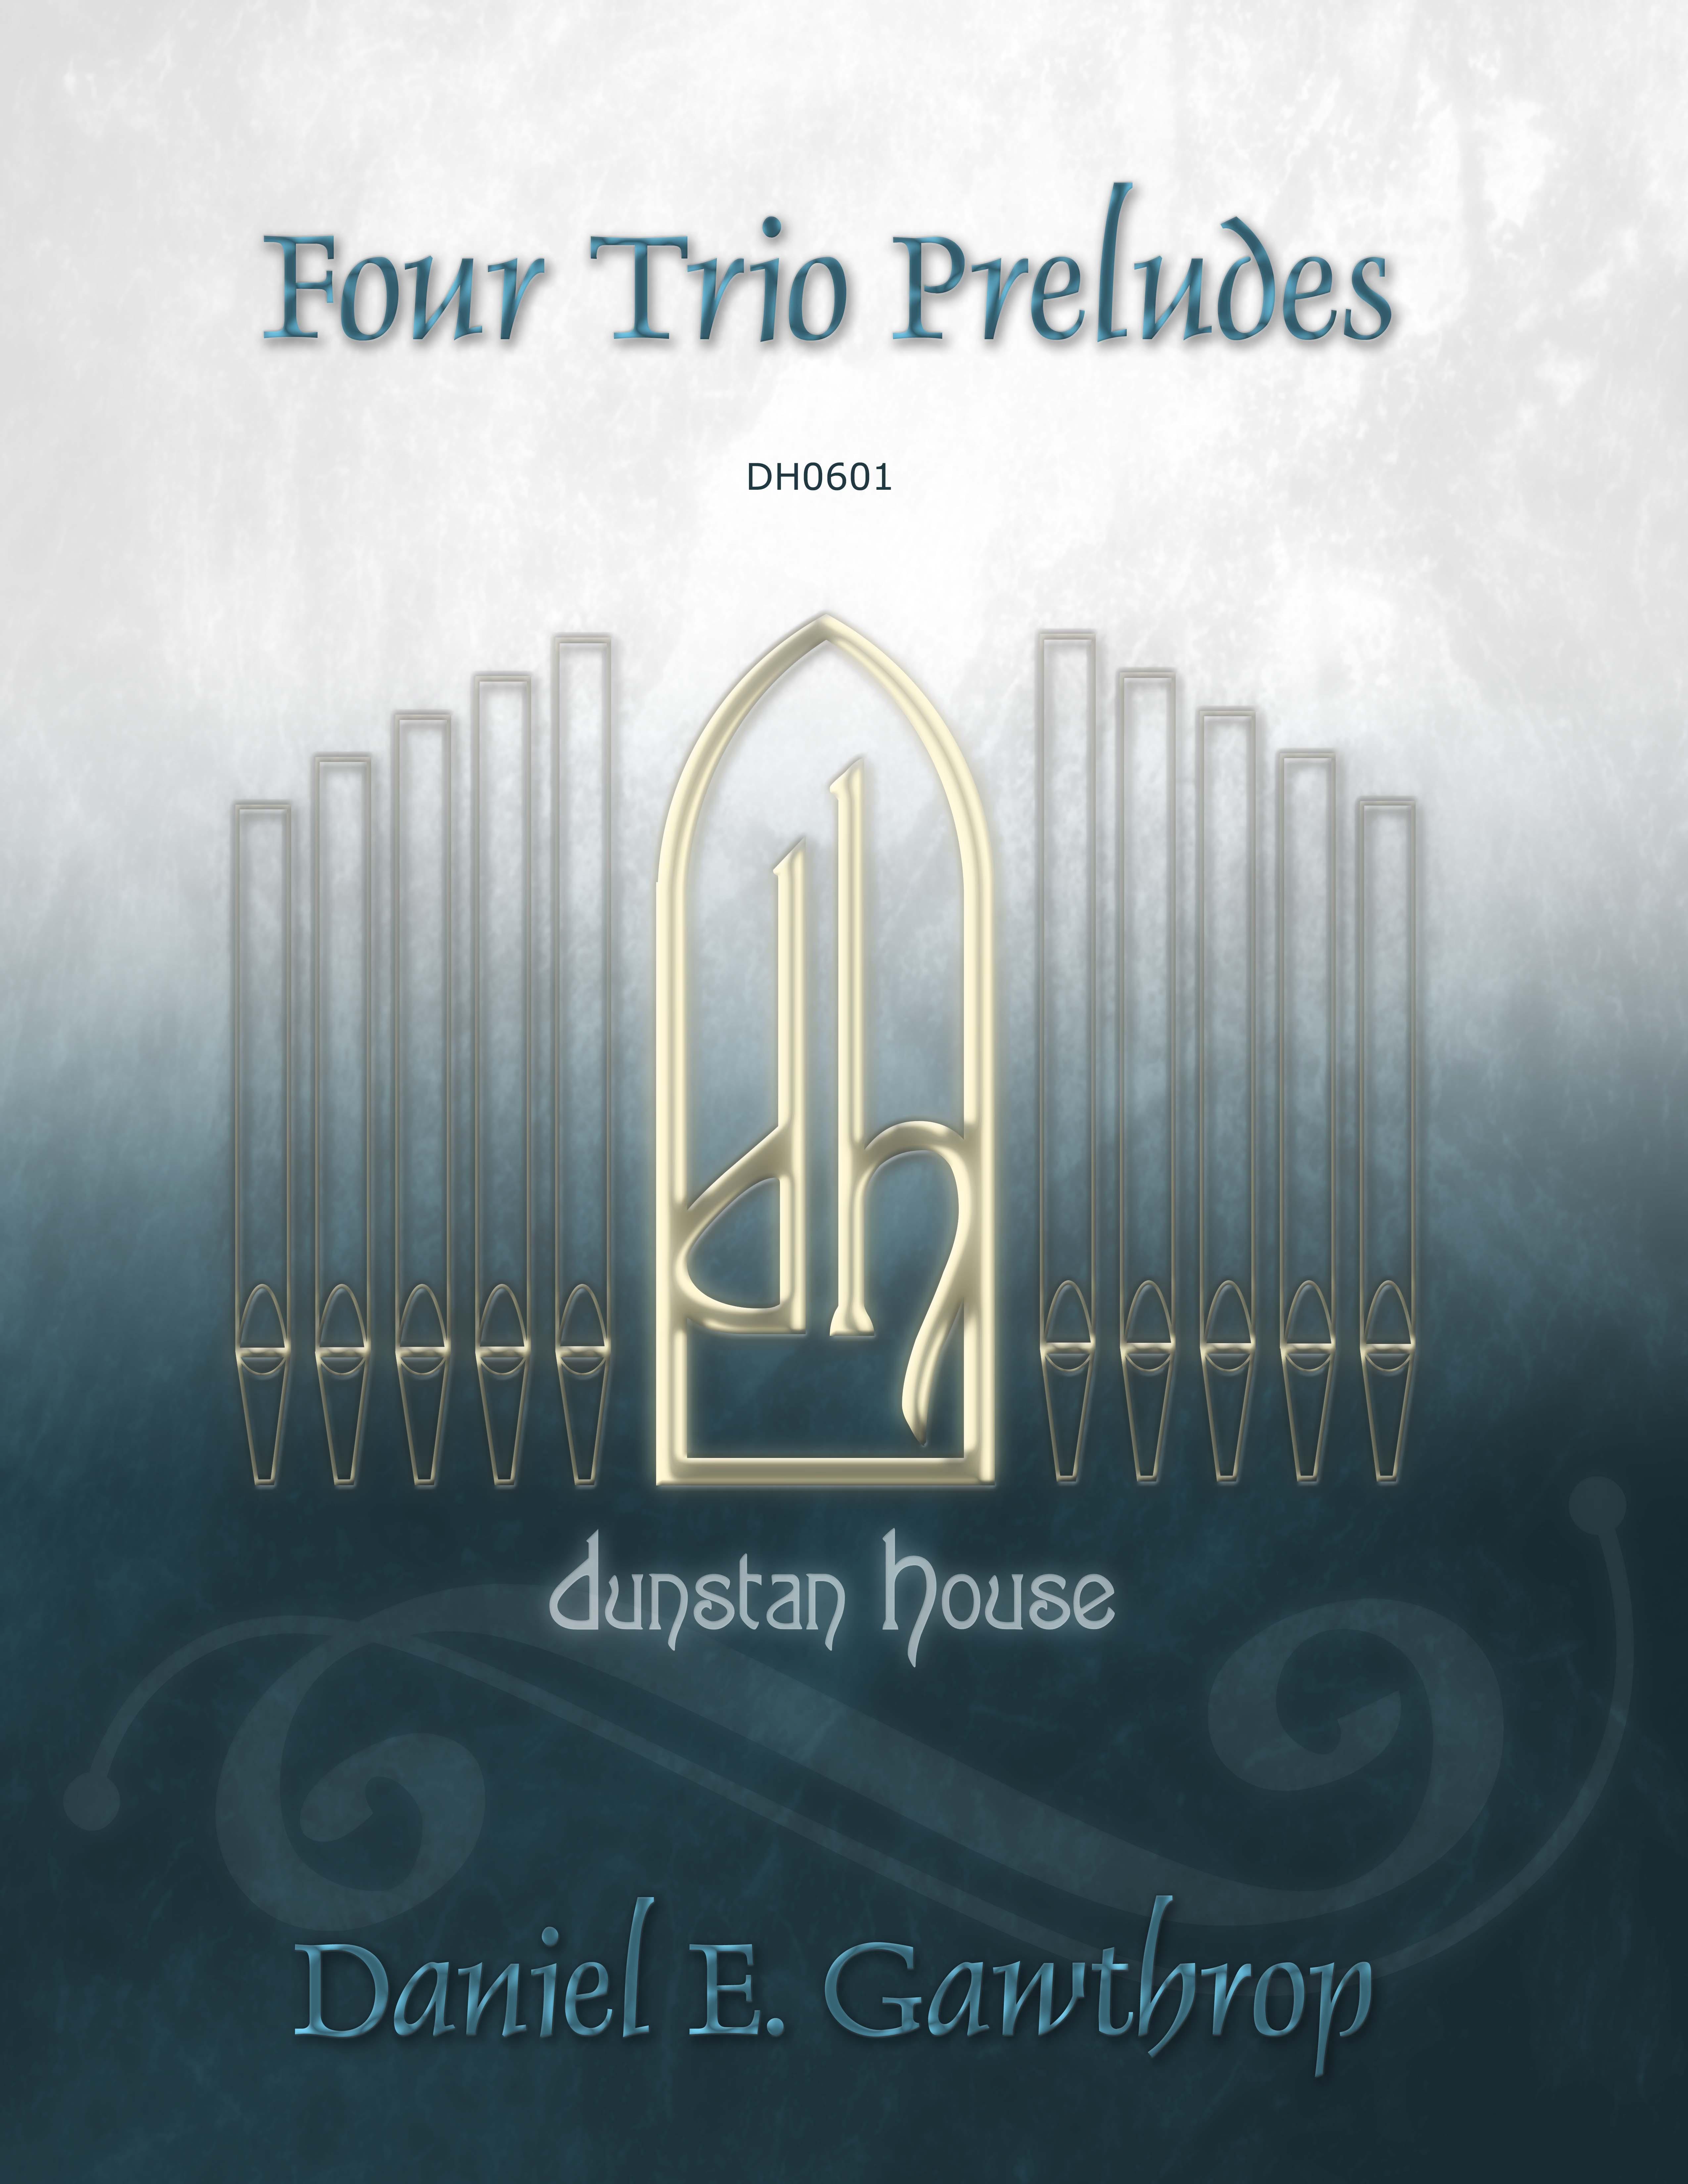 Four Trio Preludes